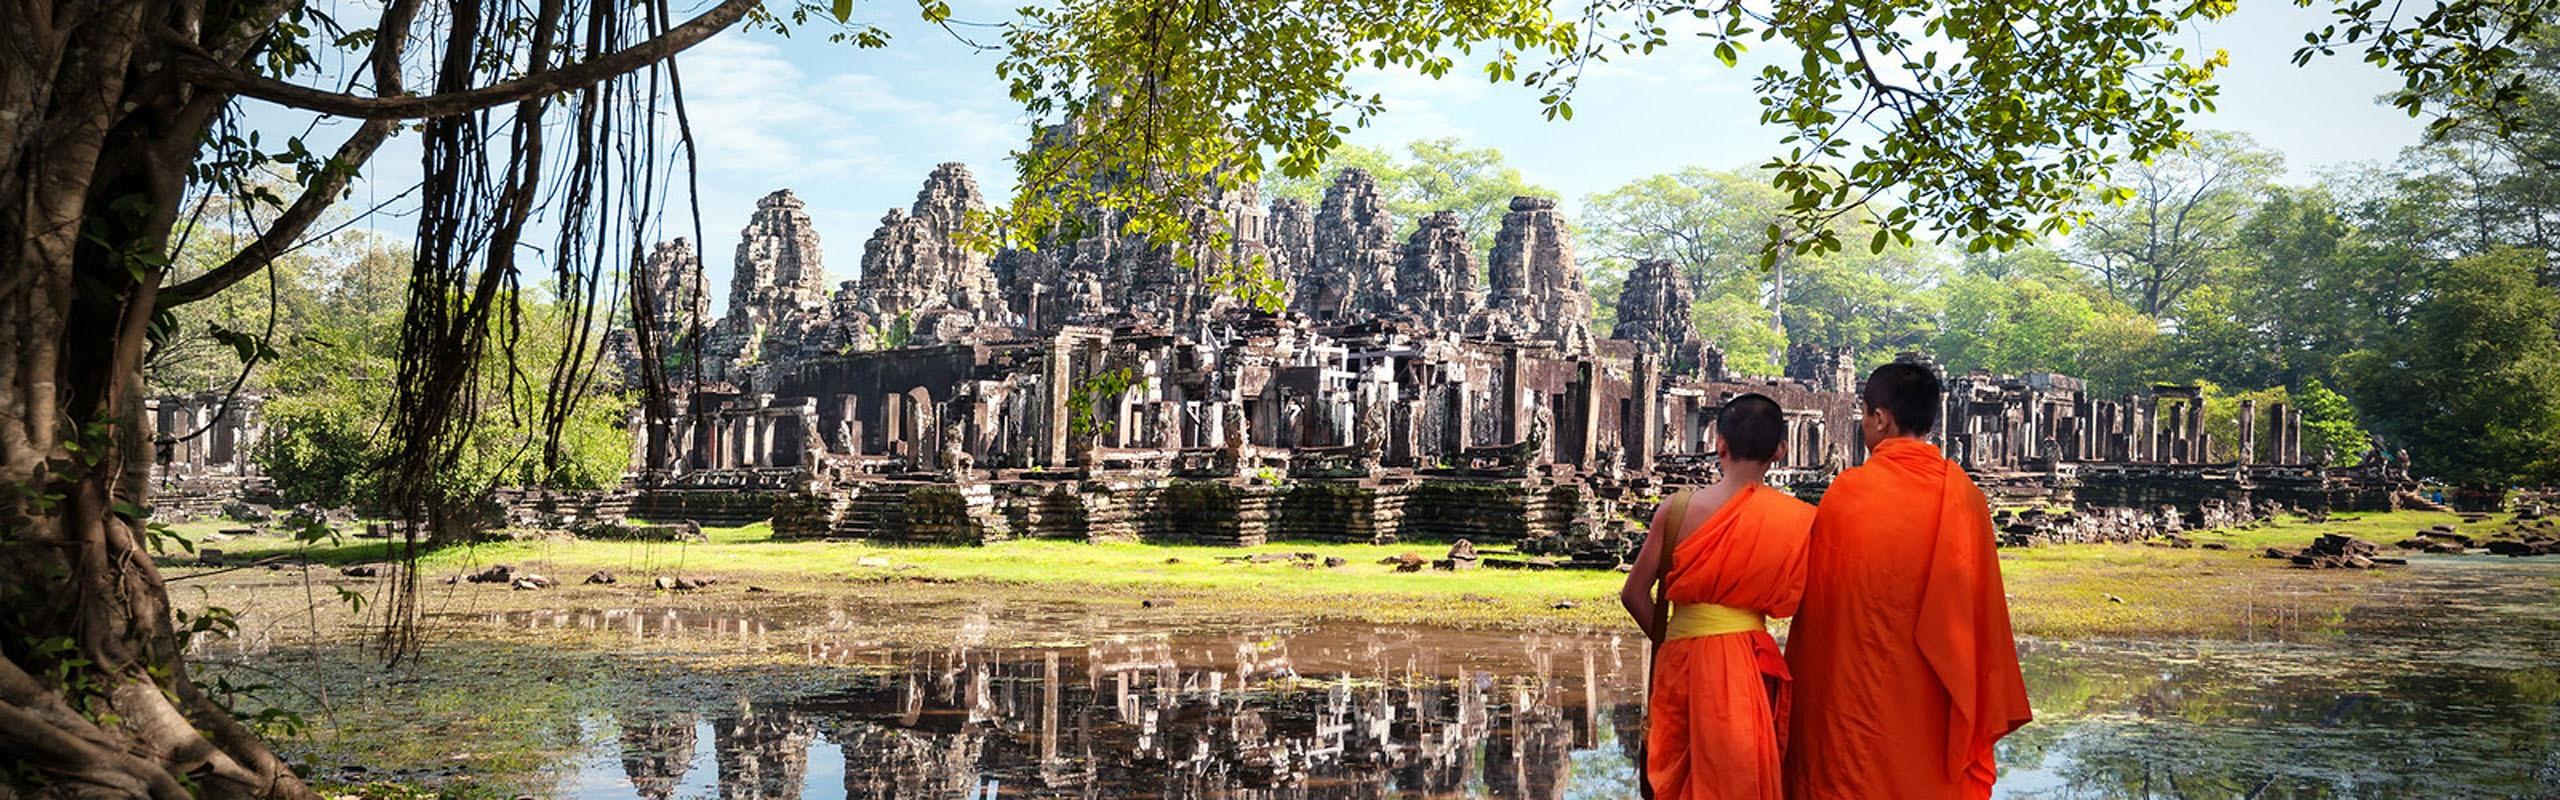 The Angkor Period in Cambodia